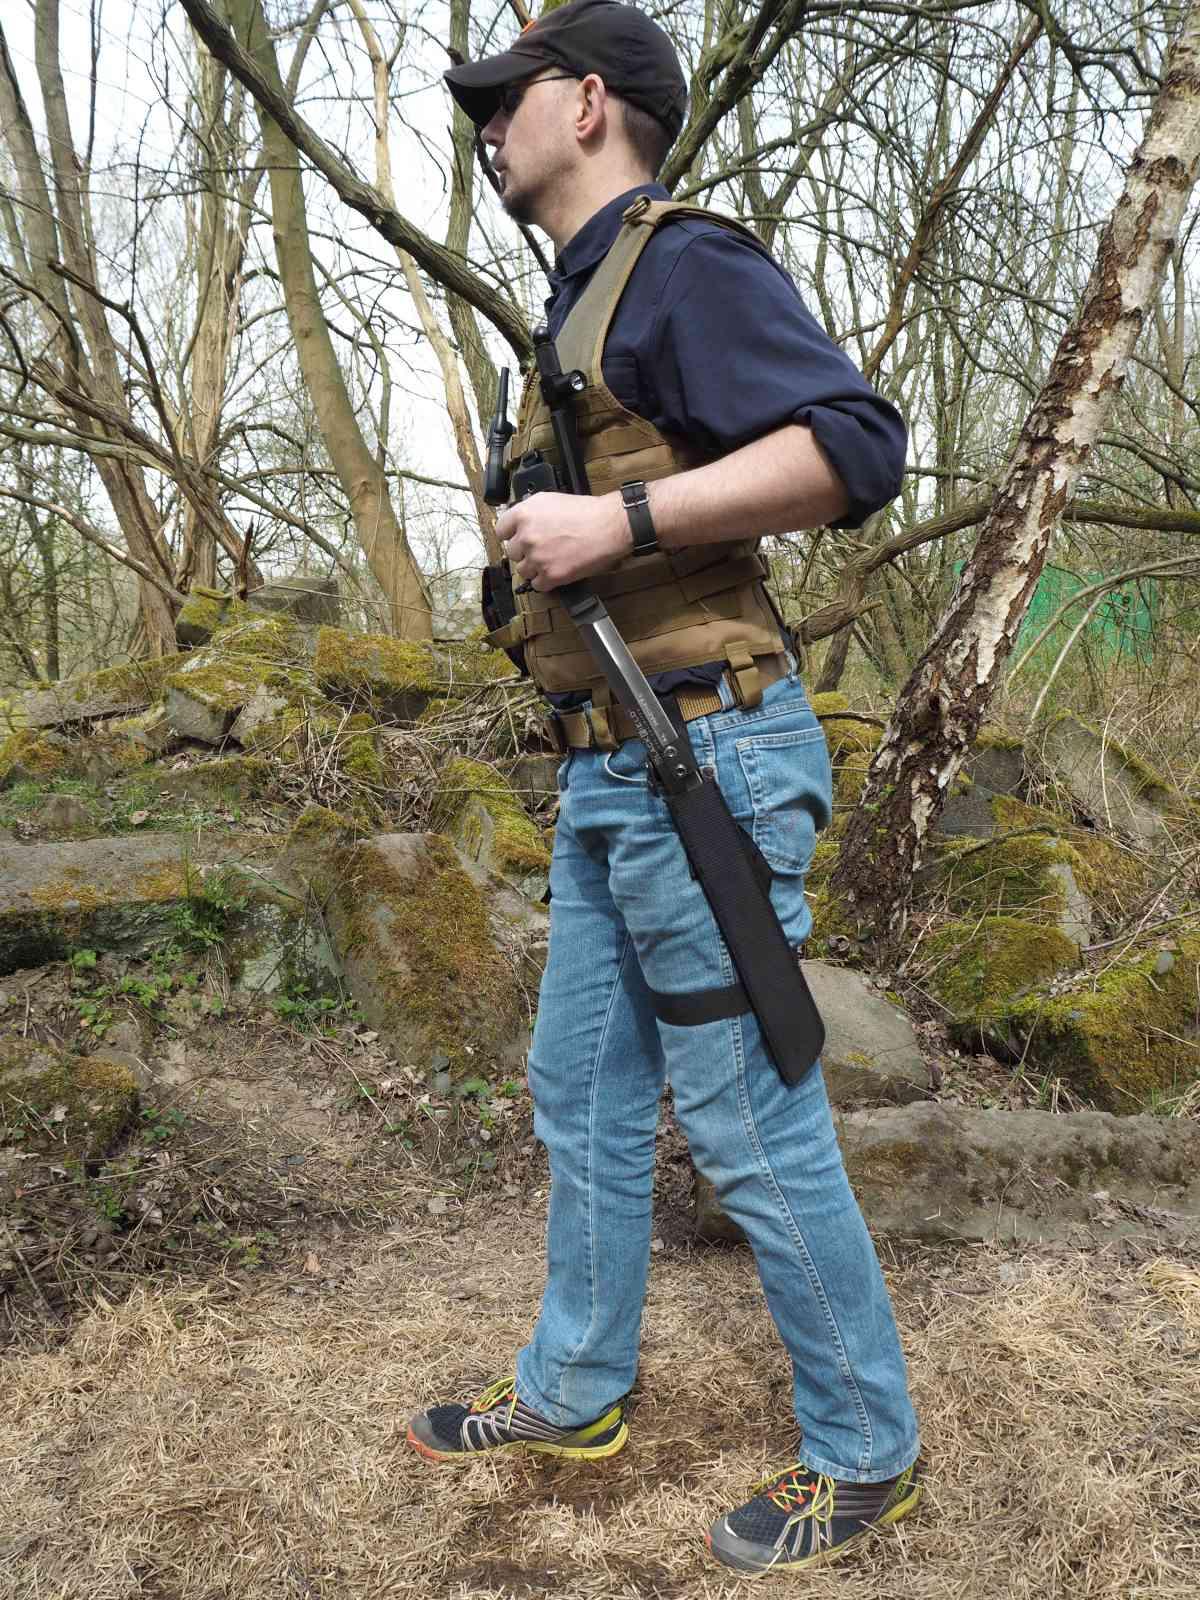 Blackfield Tactical Machete - Ziehrichtung